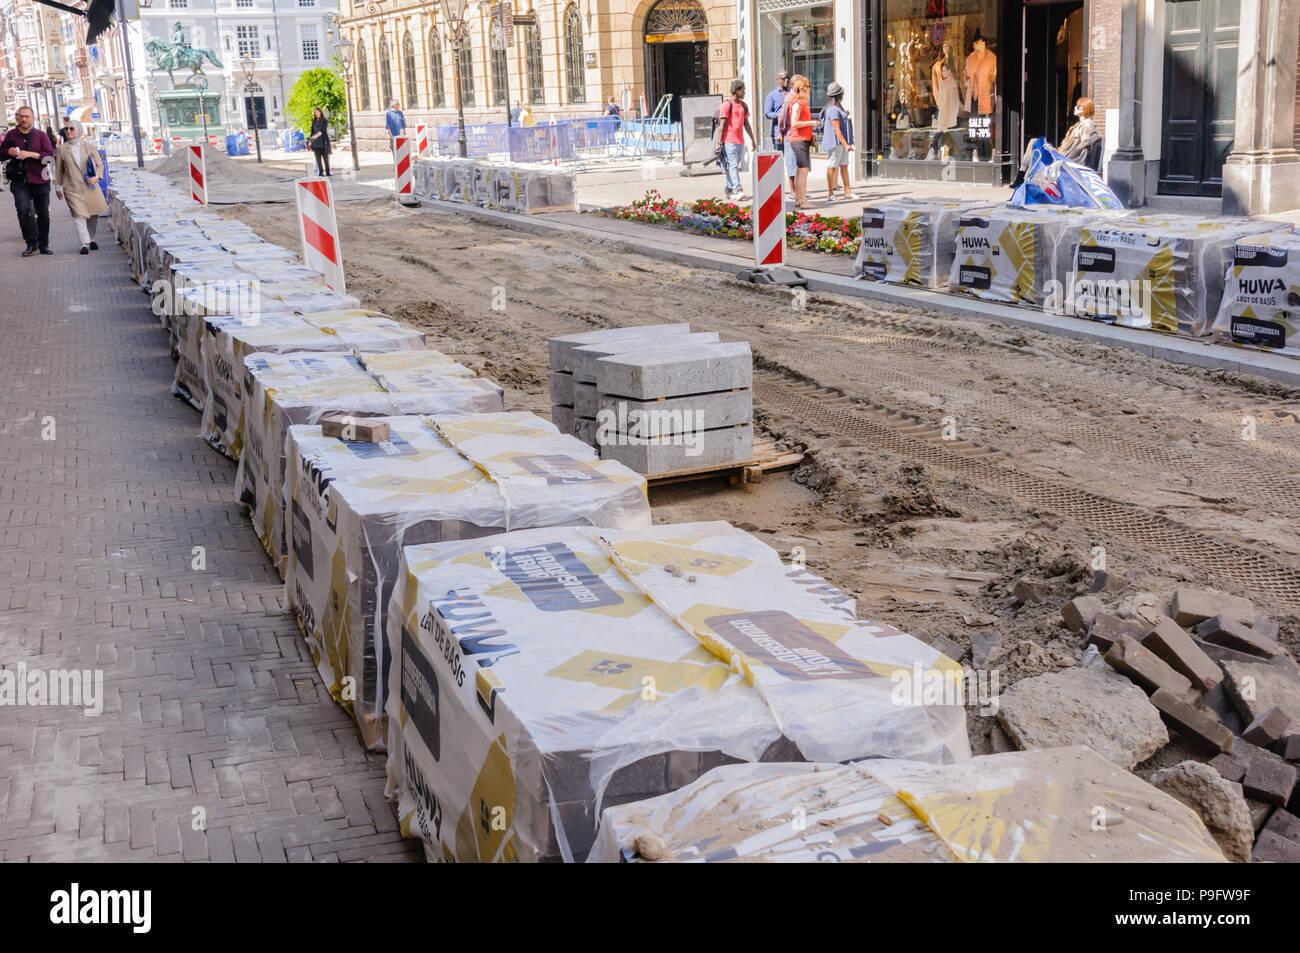 Roadworks underway in a European city. - Stock Image